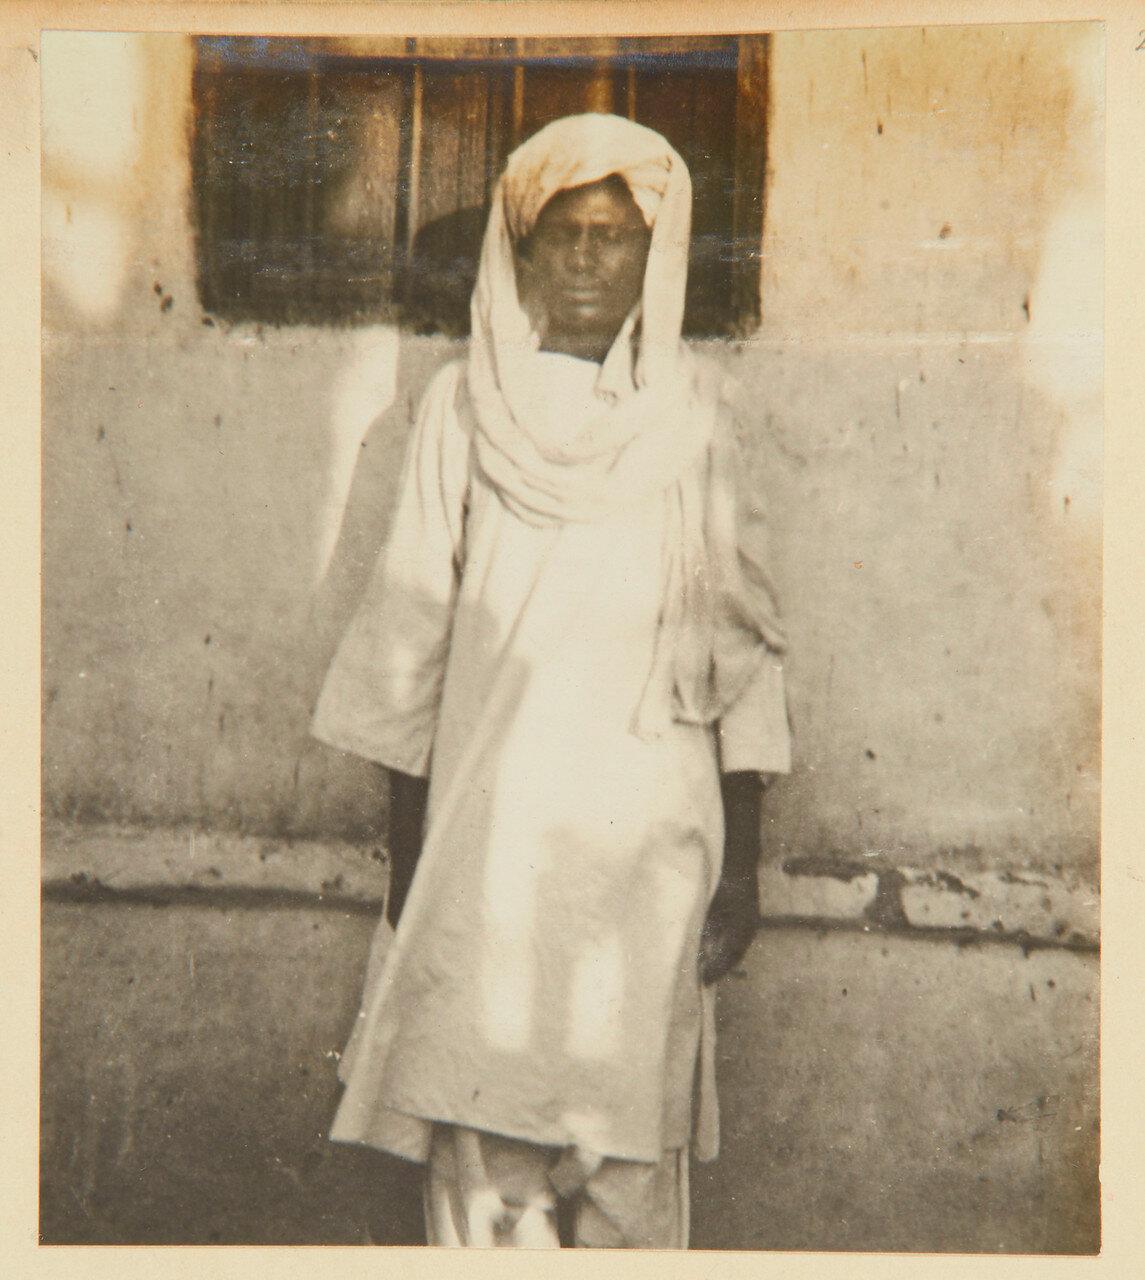 10 августа 1898. Махмуд в тюрьме Вади-Хальфы